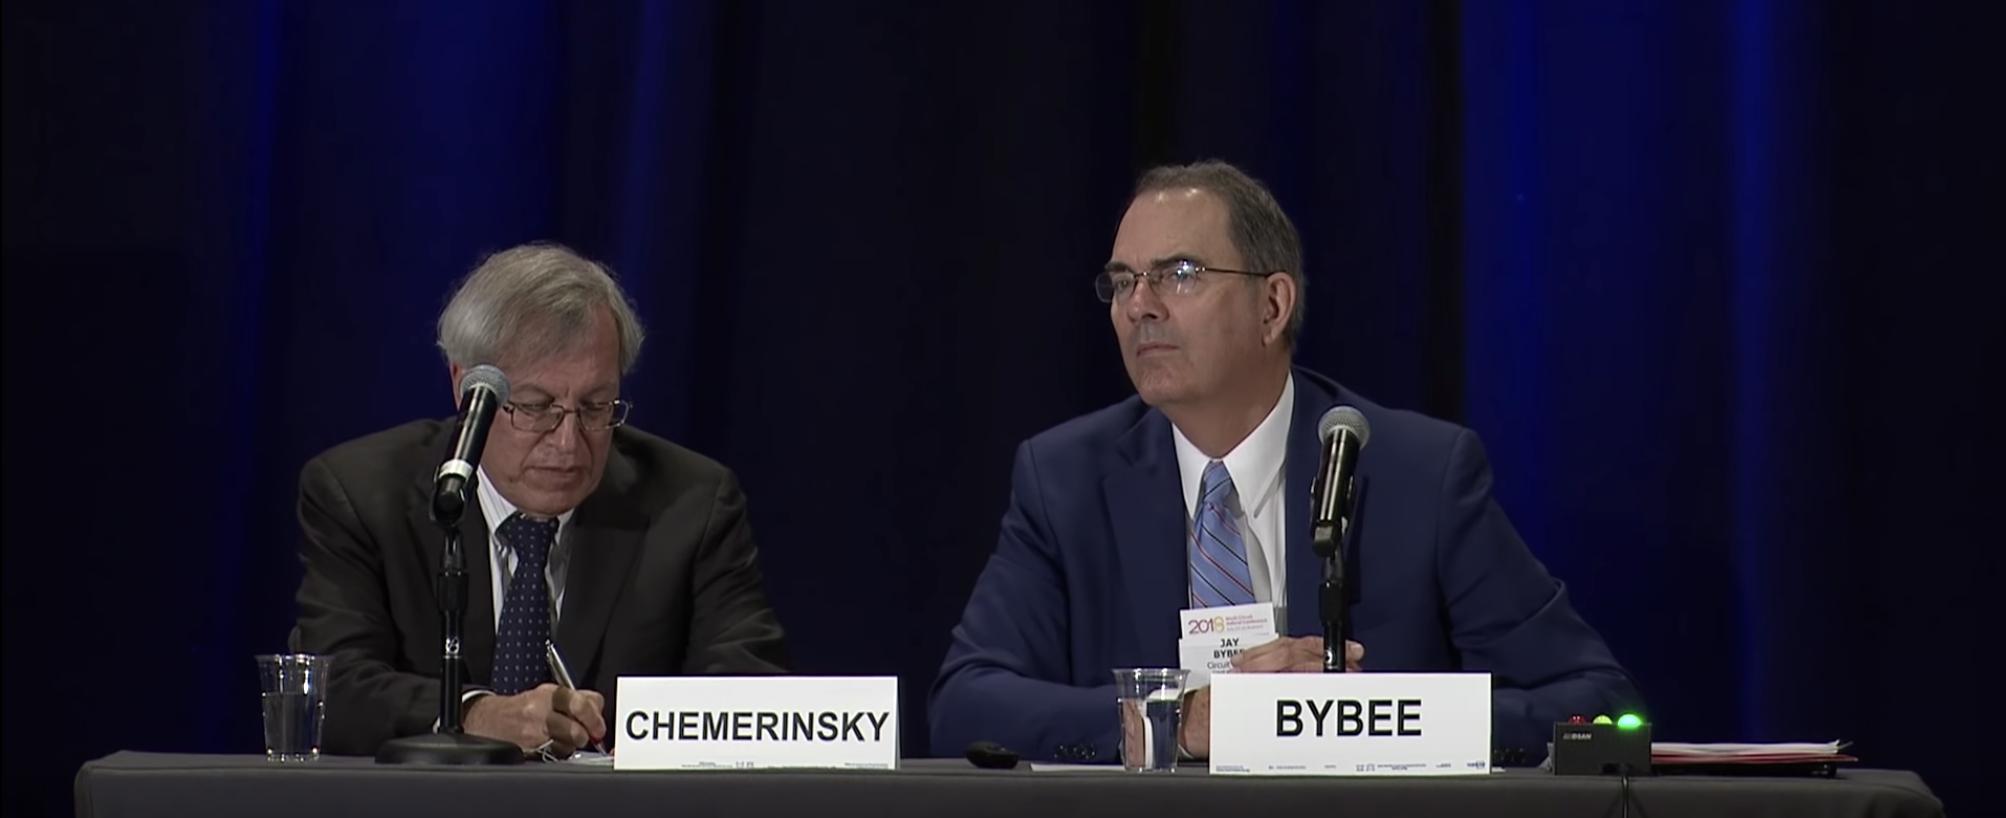 Judge Jay Bybee speaks on a panel with Berkeley Dean Erwin Chemerinsky in October 2018. (YouTube screenshot)